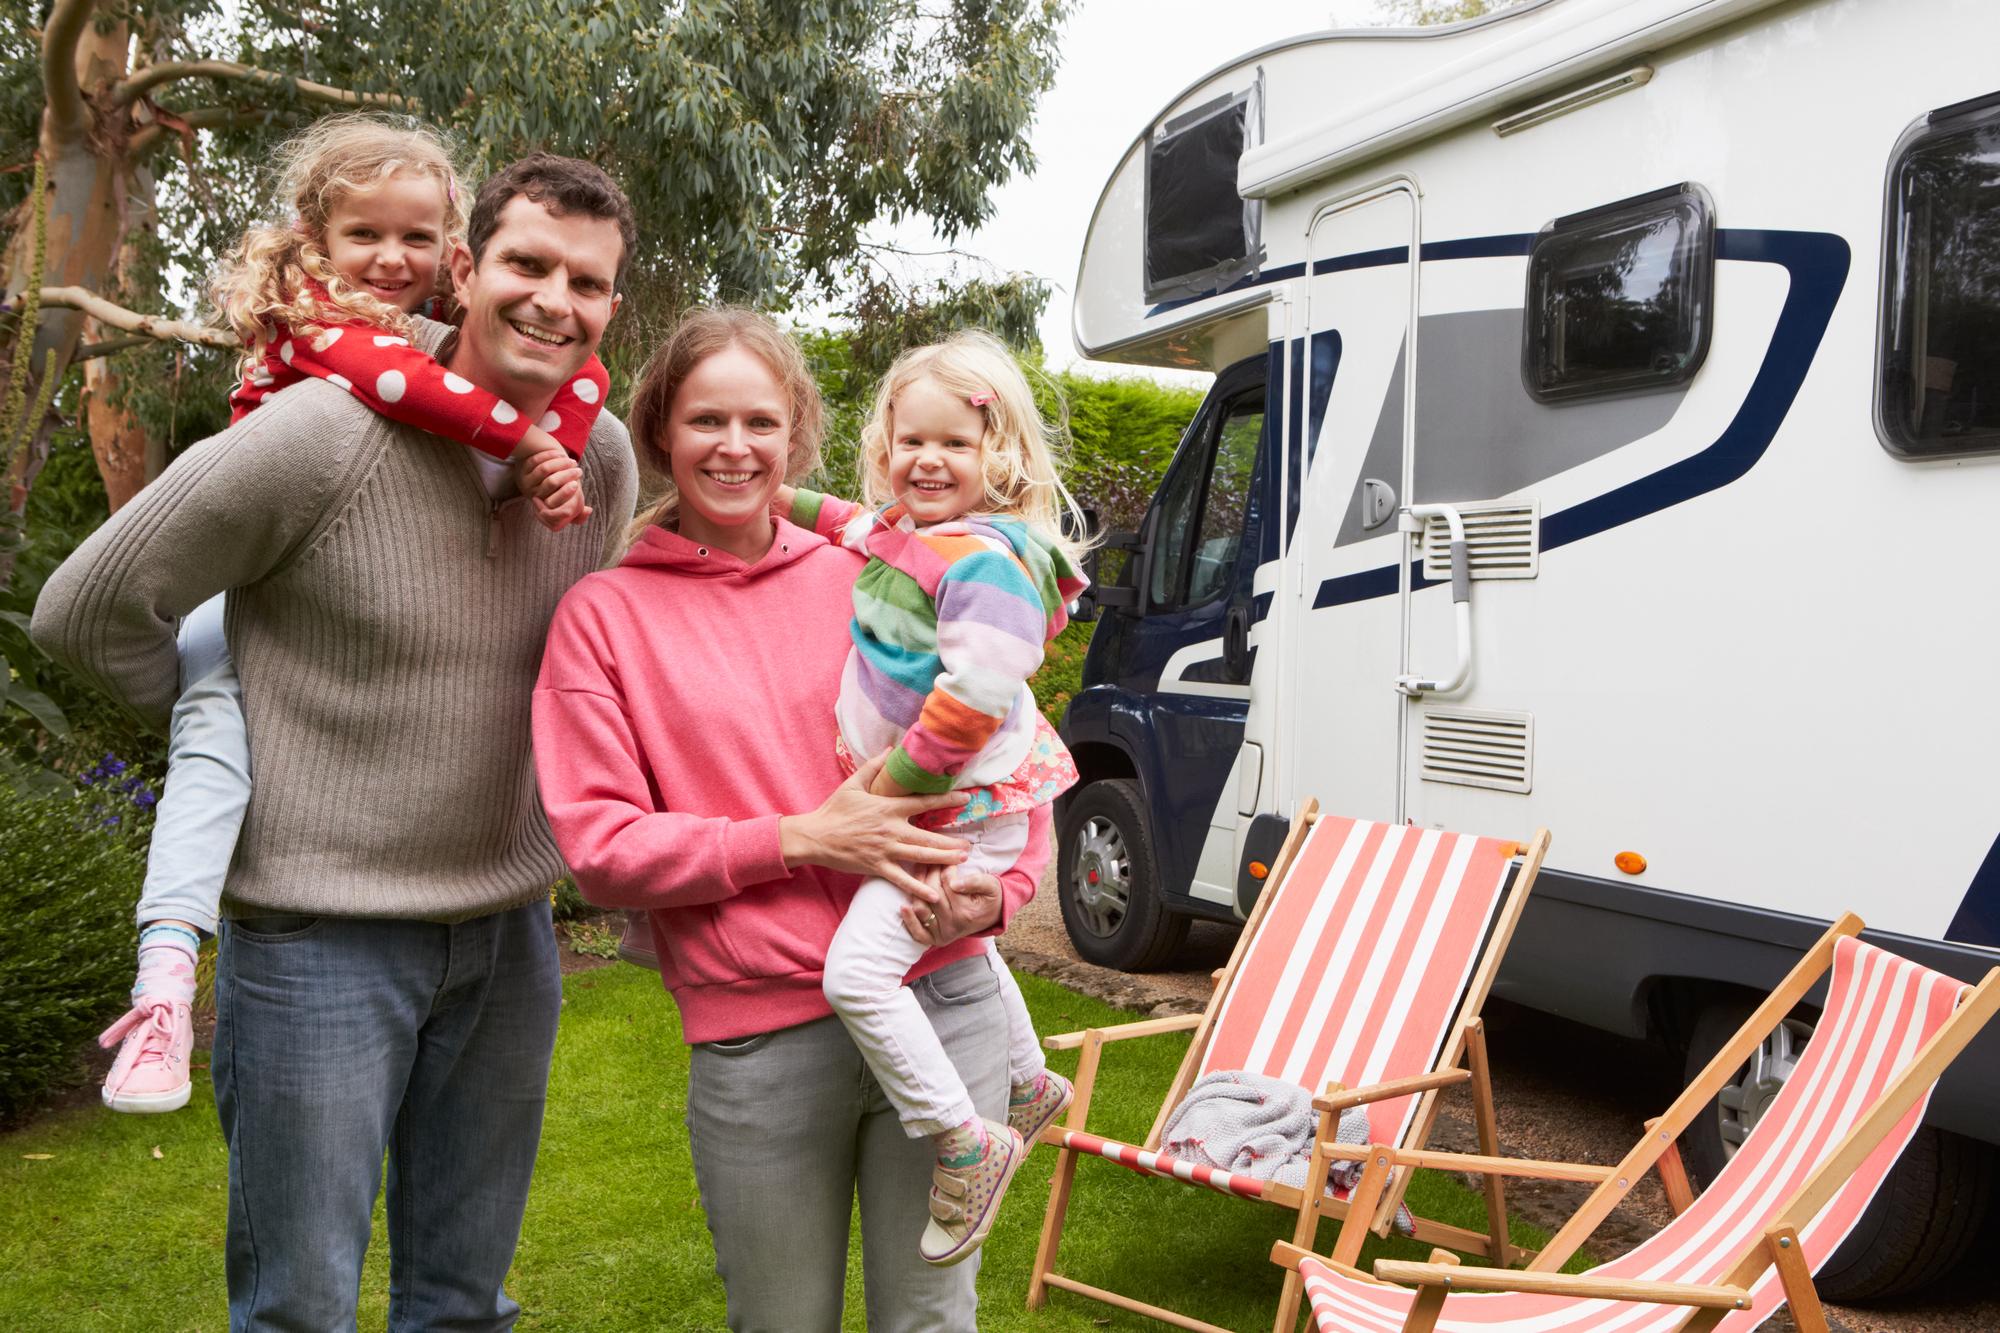 Le camping-car s'annonce comme un des musts post Covid-19 - DR : DepositPhotos